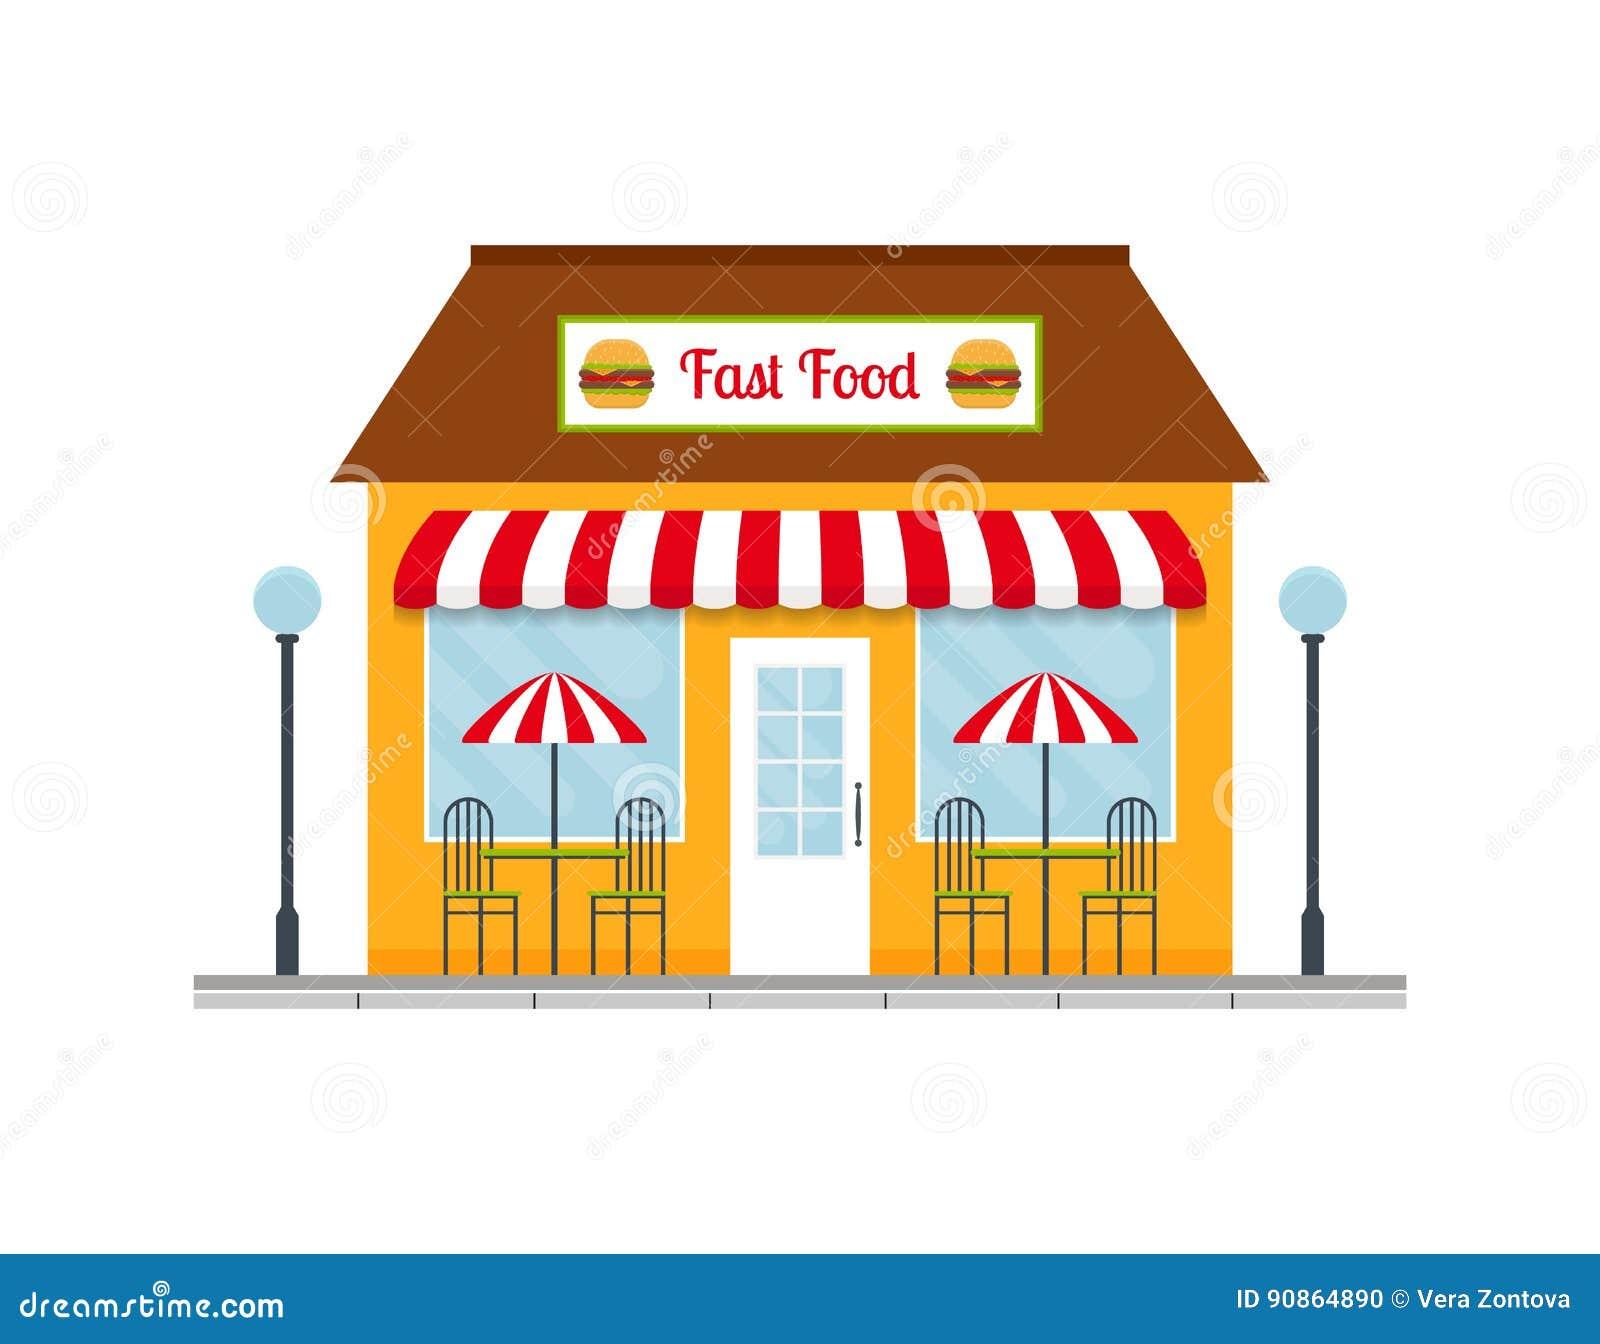 Building cartoon clipart restaurant building and restaurant building - Royalty Free Vector Download Fast Food Restaurant Building